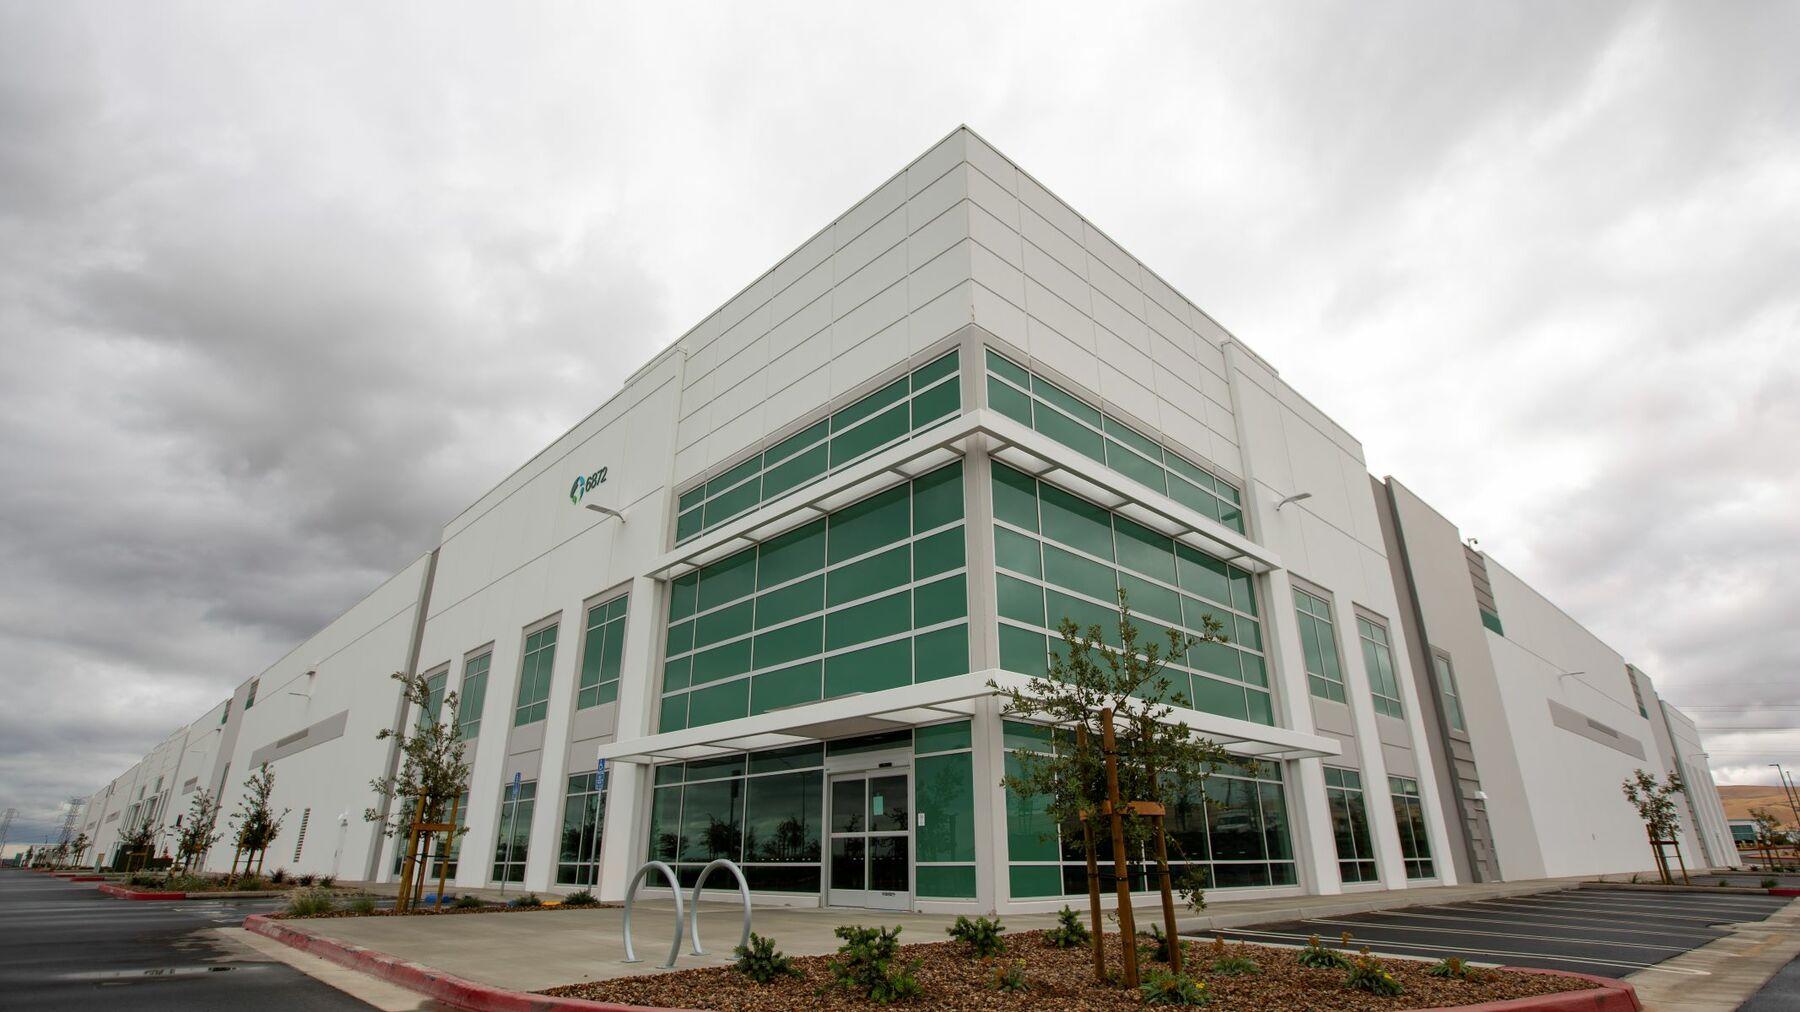 DPM-Prologis-International-Park-of-Commerce-Building-10.jpg